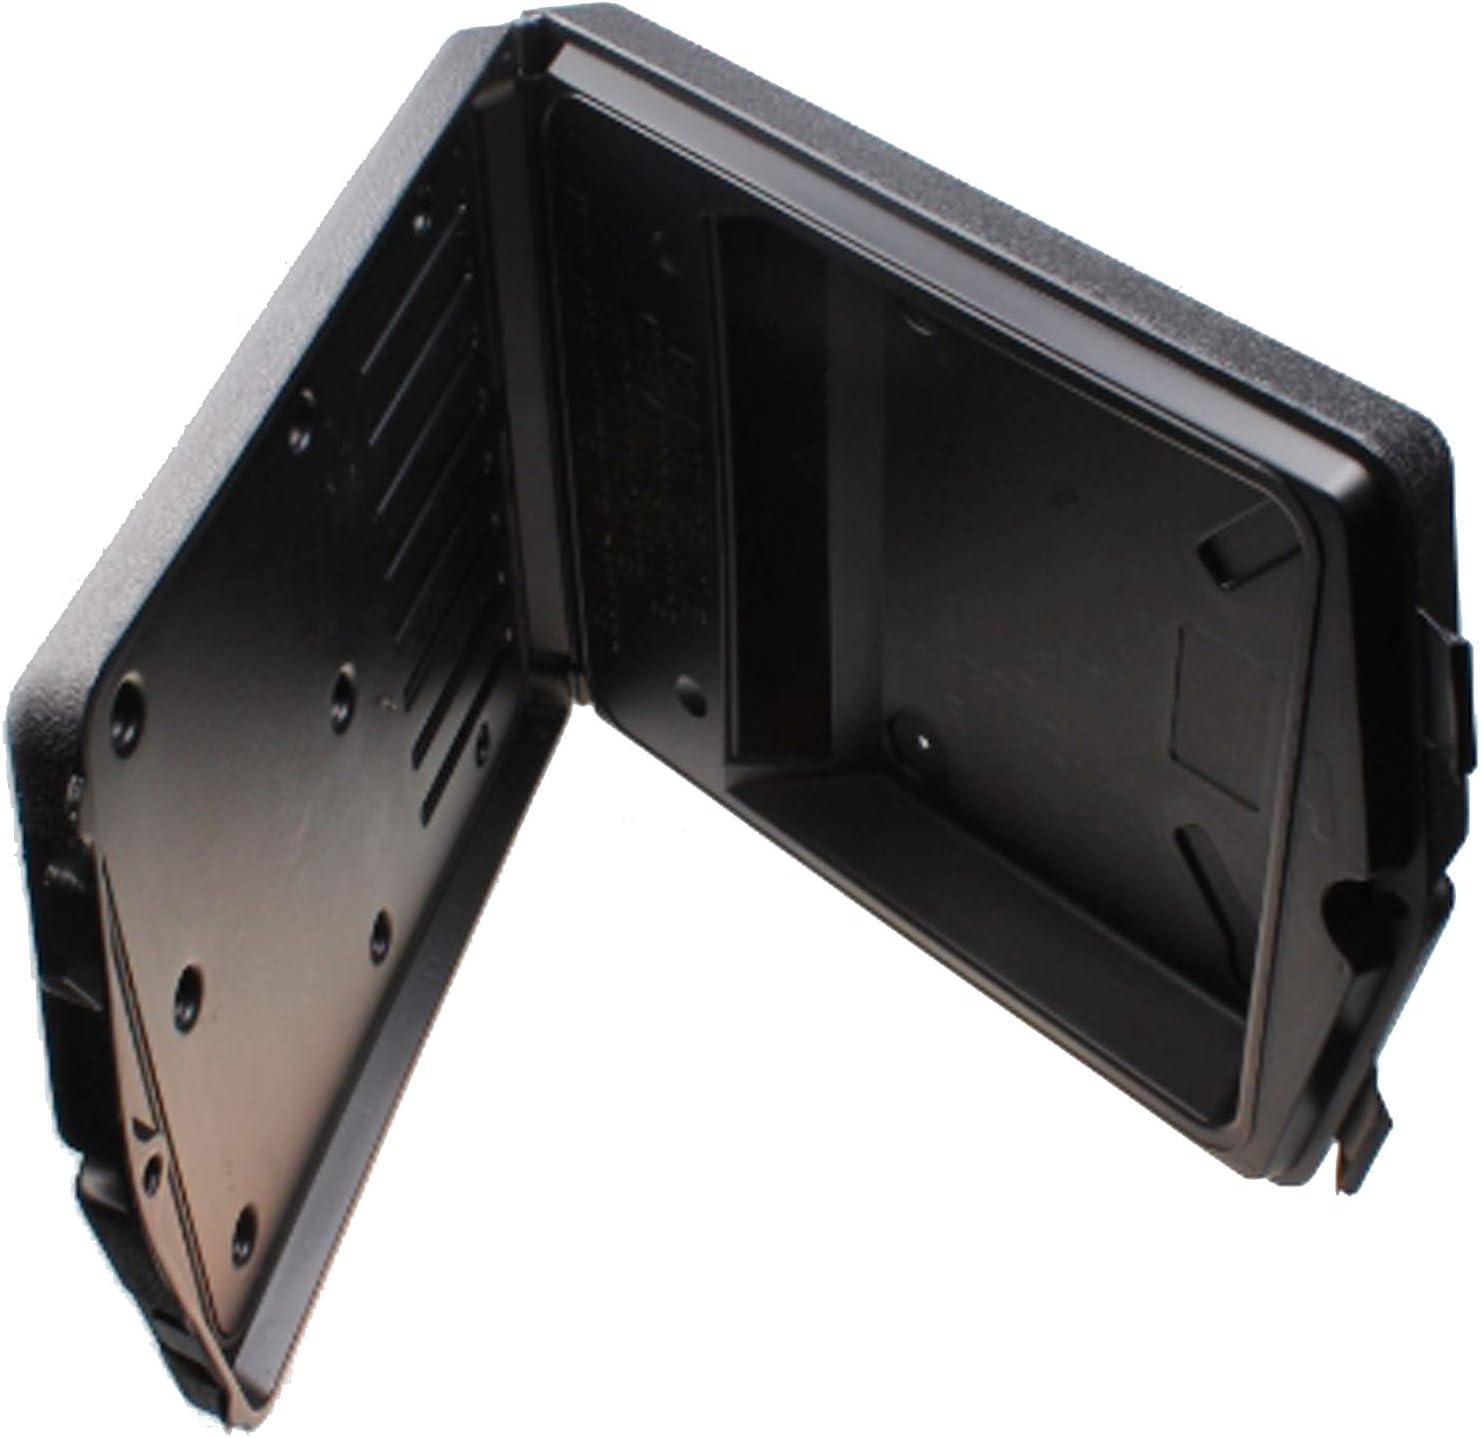 zt truck parts Manual Box Manual Holder Box 24514GT 24514 for Genie GS-2668 GS-3268 GS-5390 GS-4390 GS-1530 GS-3390 GS-1930 Z-60-34 GS-3246 Z-135-70 Z-45-25 S-45 S-125 S-120 S-100 Z-45-22 Z-60-34 Z-45